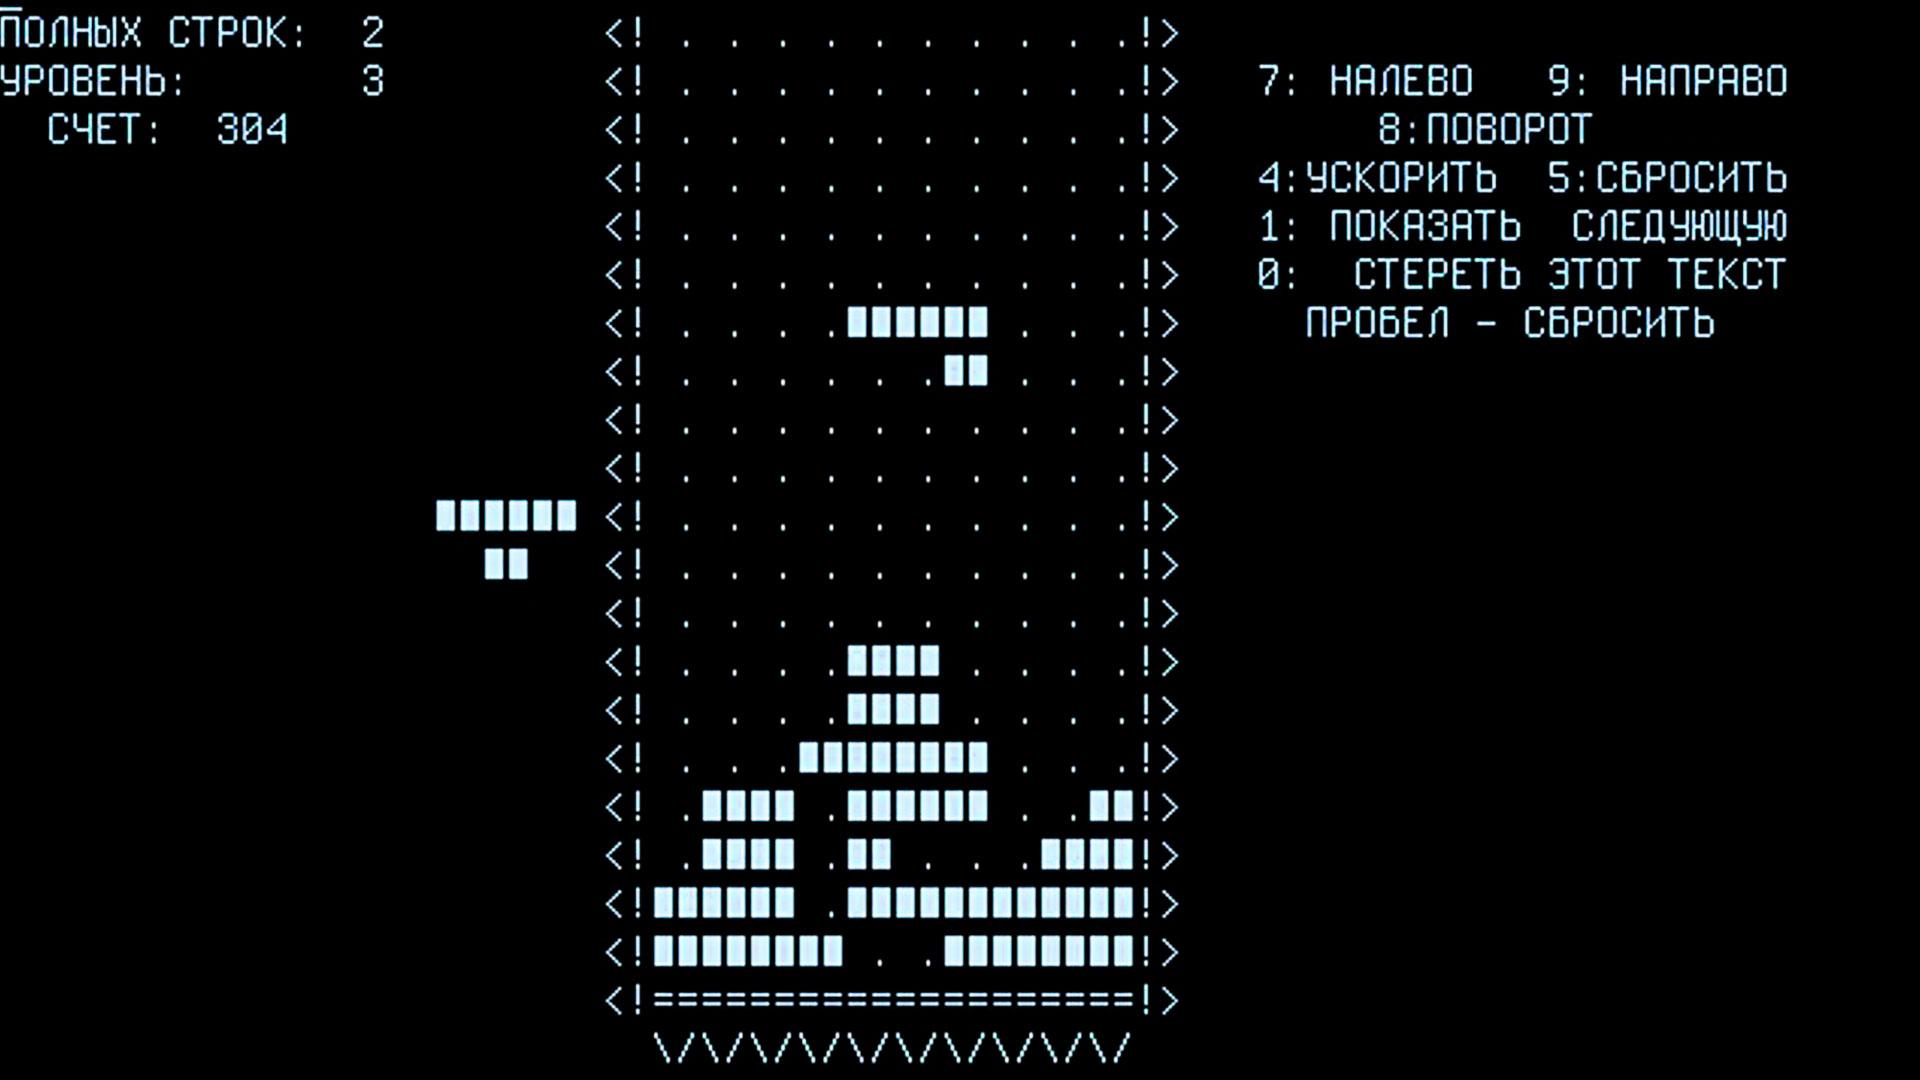 Тетрис самая продаваемая игра